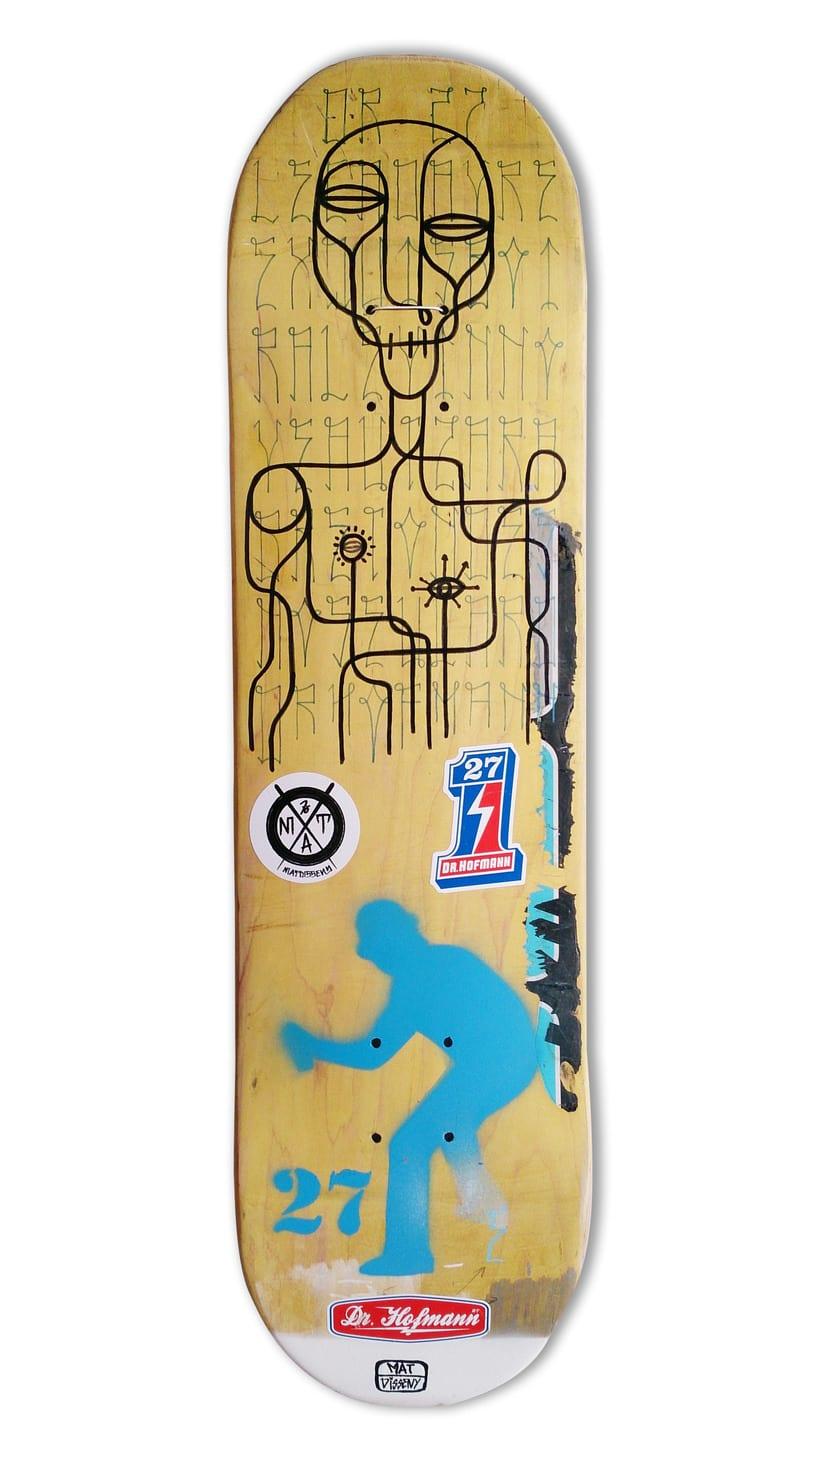 Skateboard • @drhofmann27 x @matdisseny #SkateArt -1